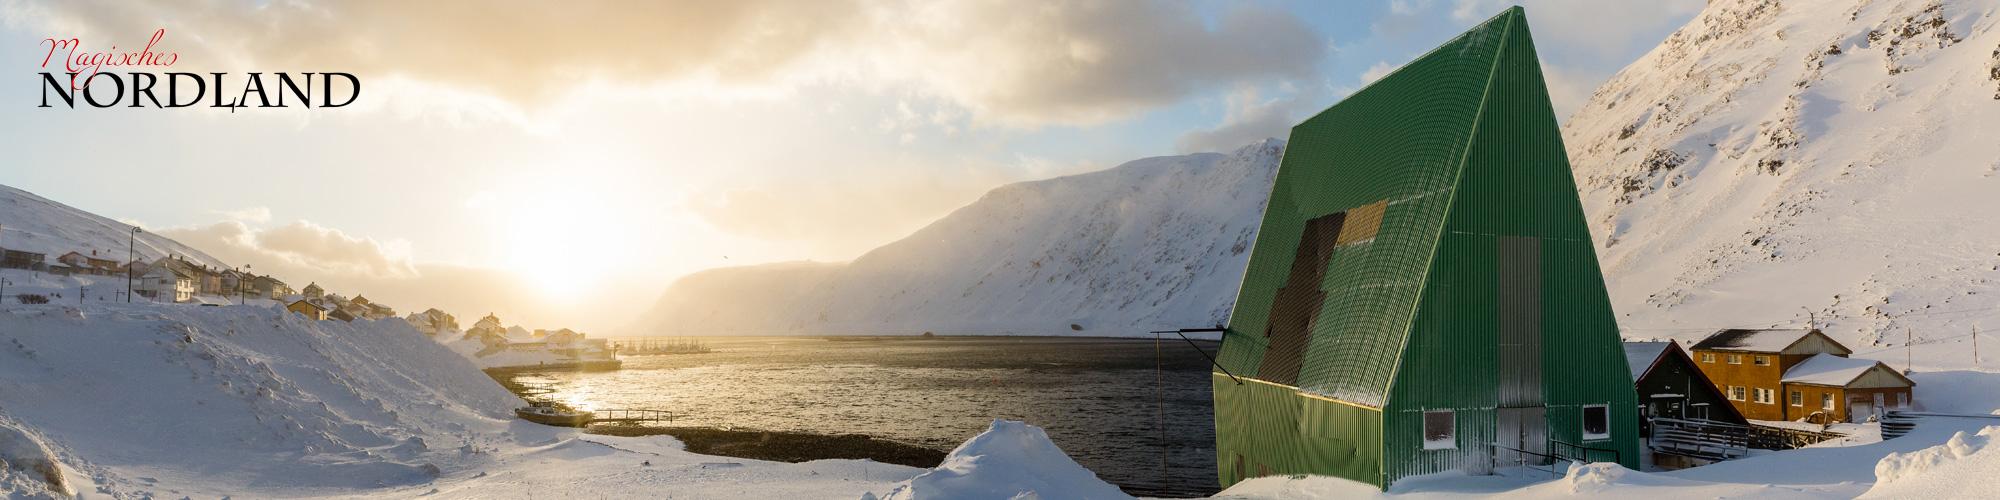 Magisches Nordland